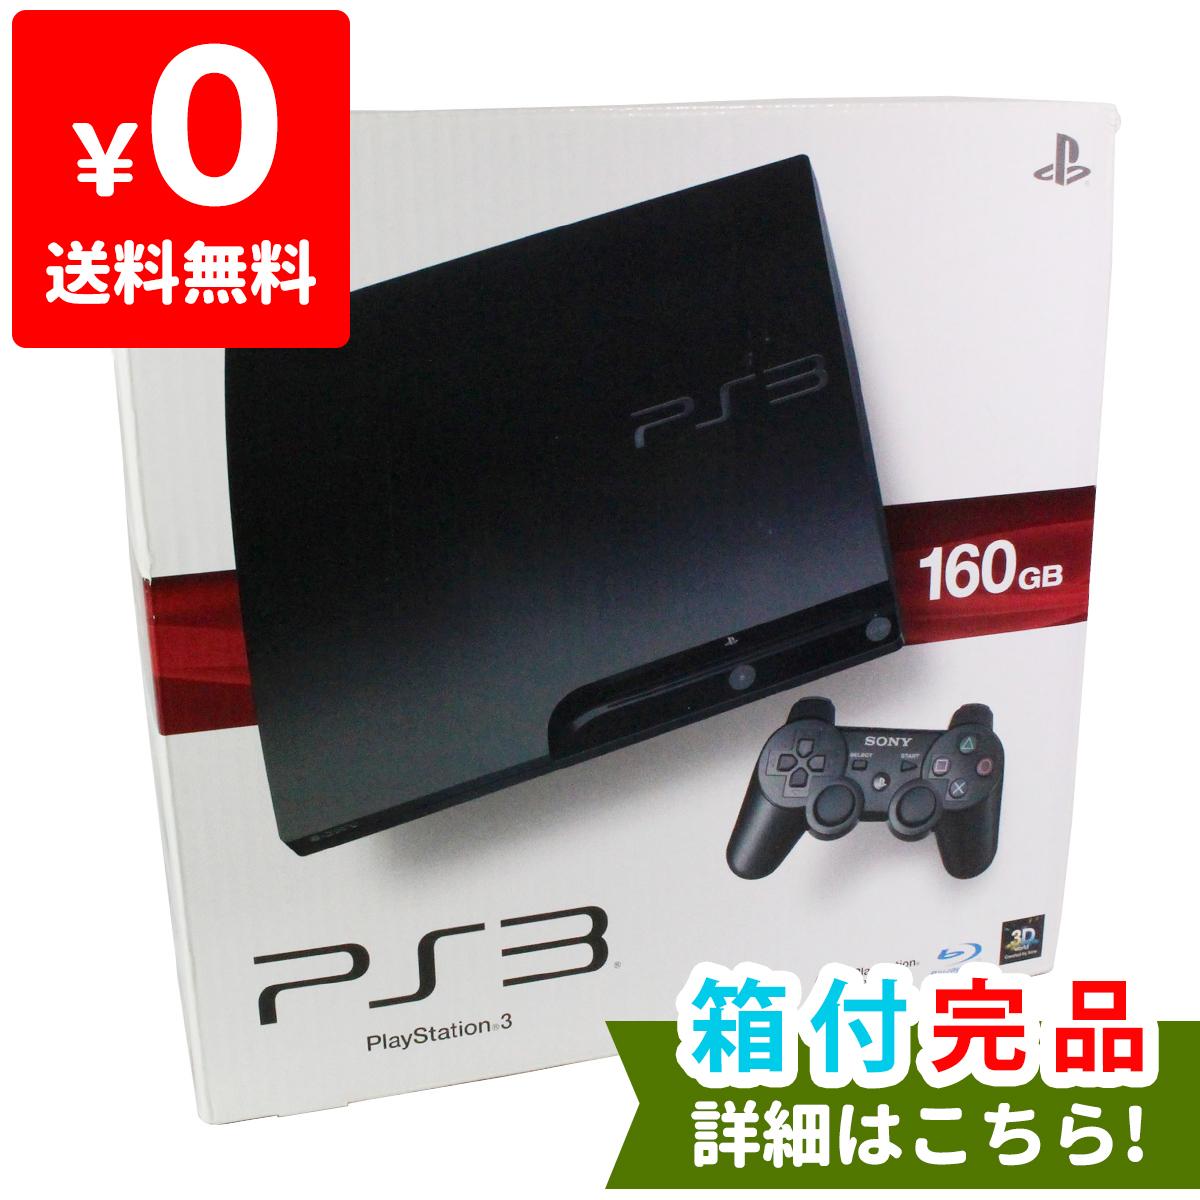 PS3 プレステ3 PlayStation 3 (160GB) チャコール・ブラック (CECH-2500A) SONY ゲーム機 中古 完品 4948872412476 送料無料 【中古】